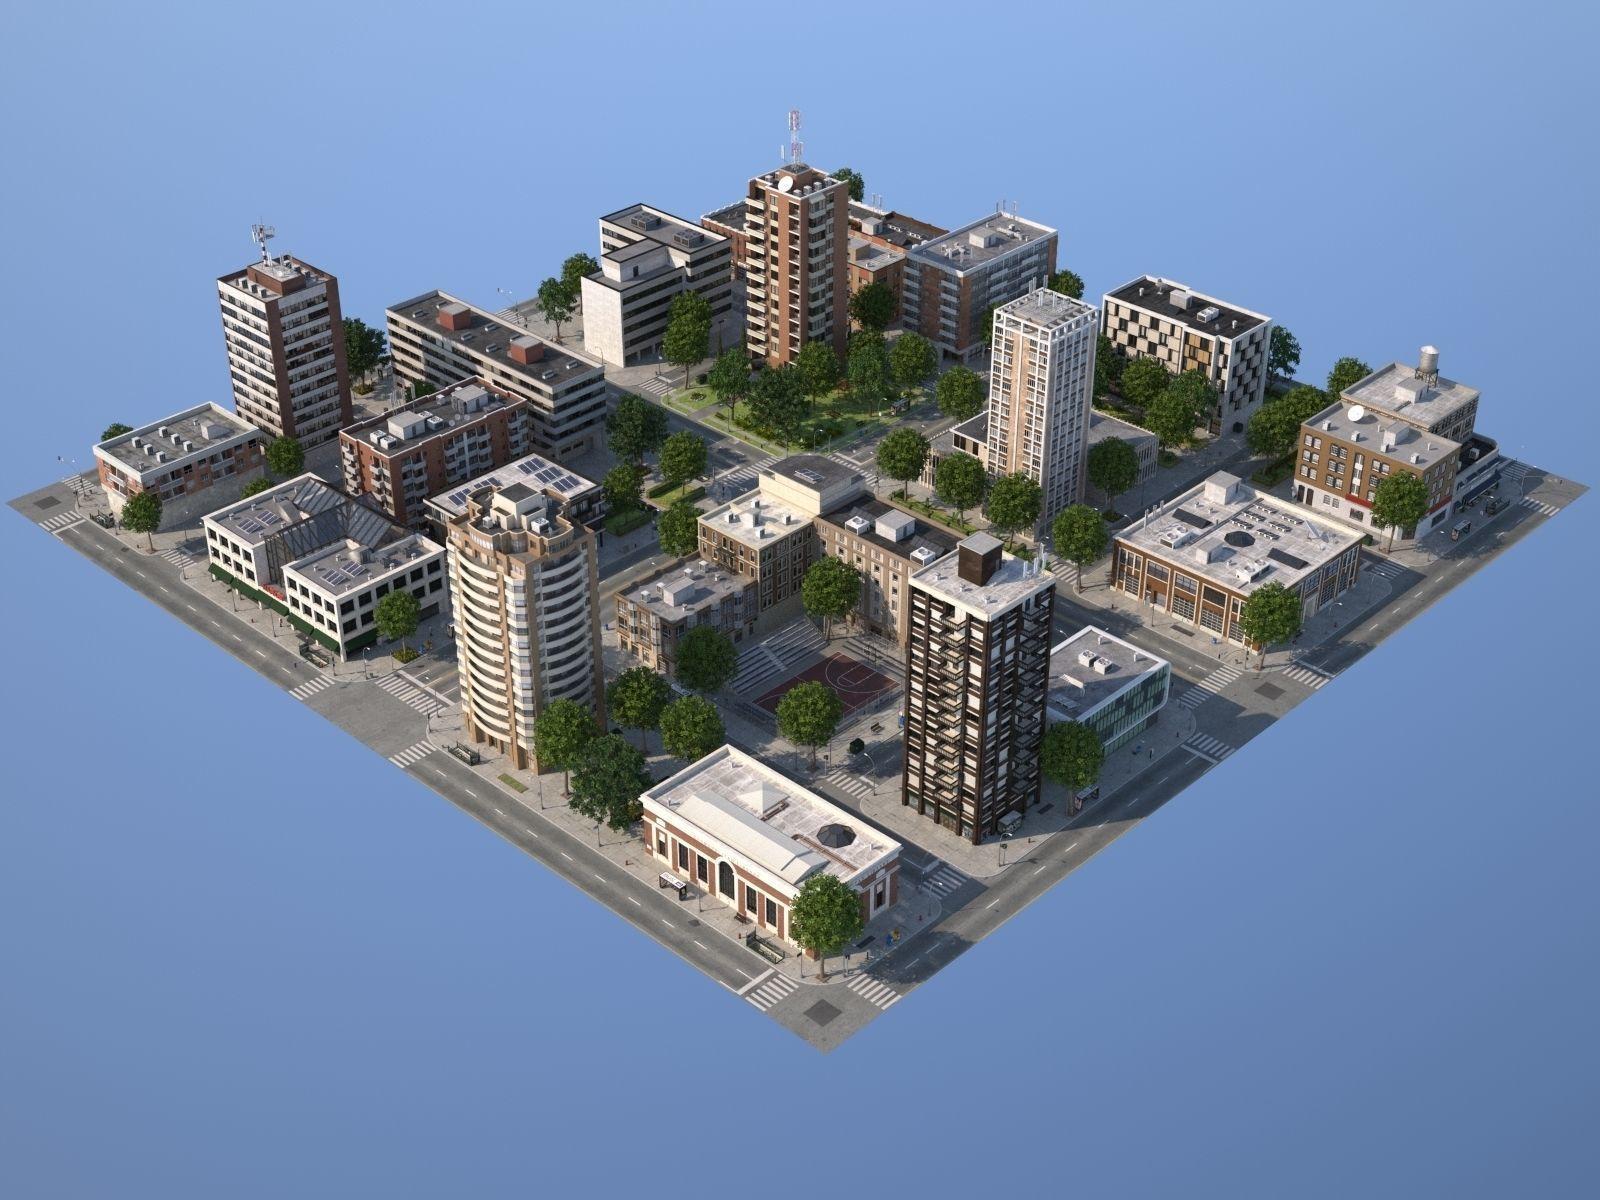 dba716a8fc1 City medium size 3D model | CGTrader | tiled in 2019 | City model ...